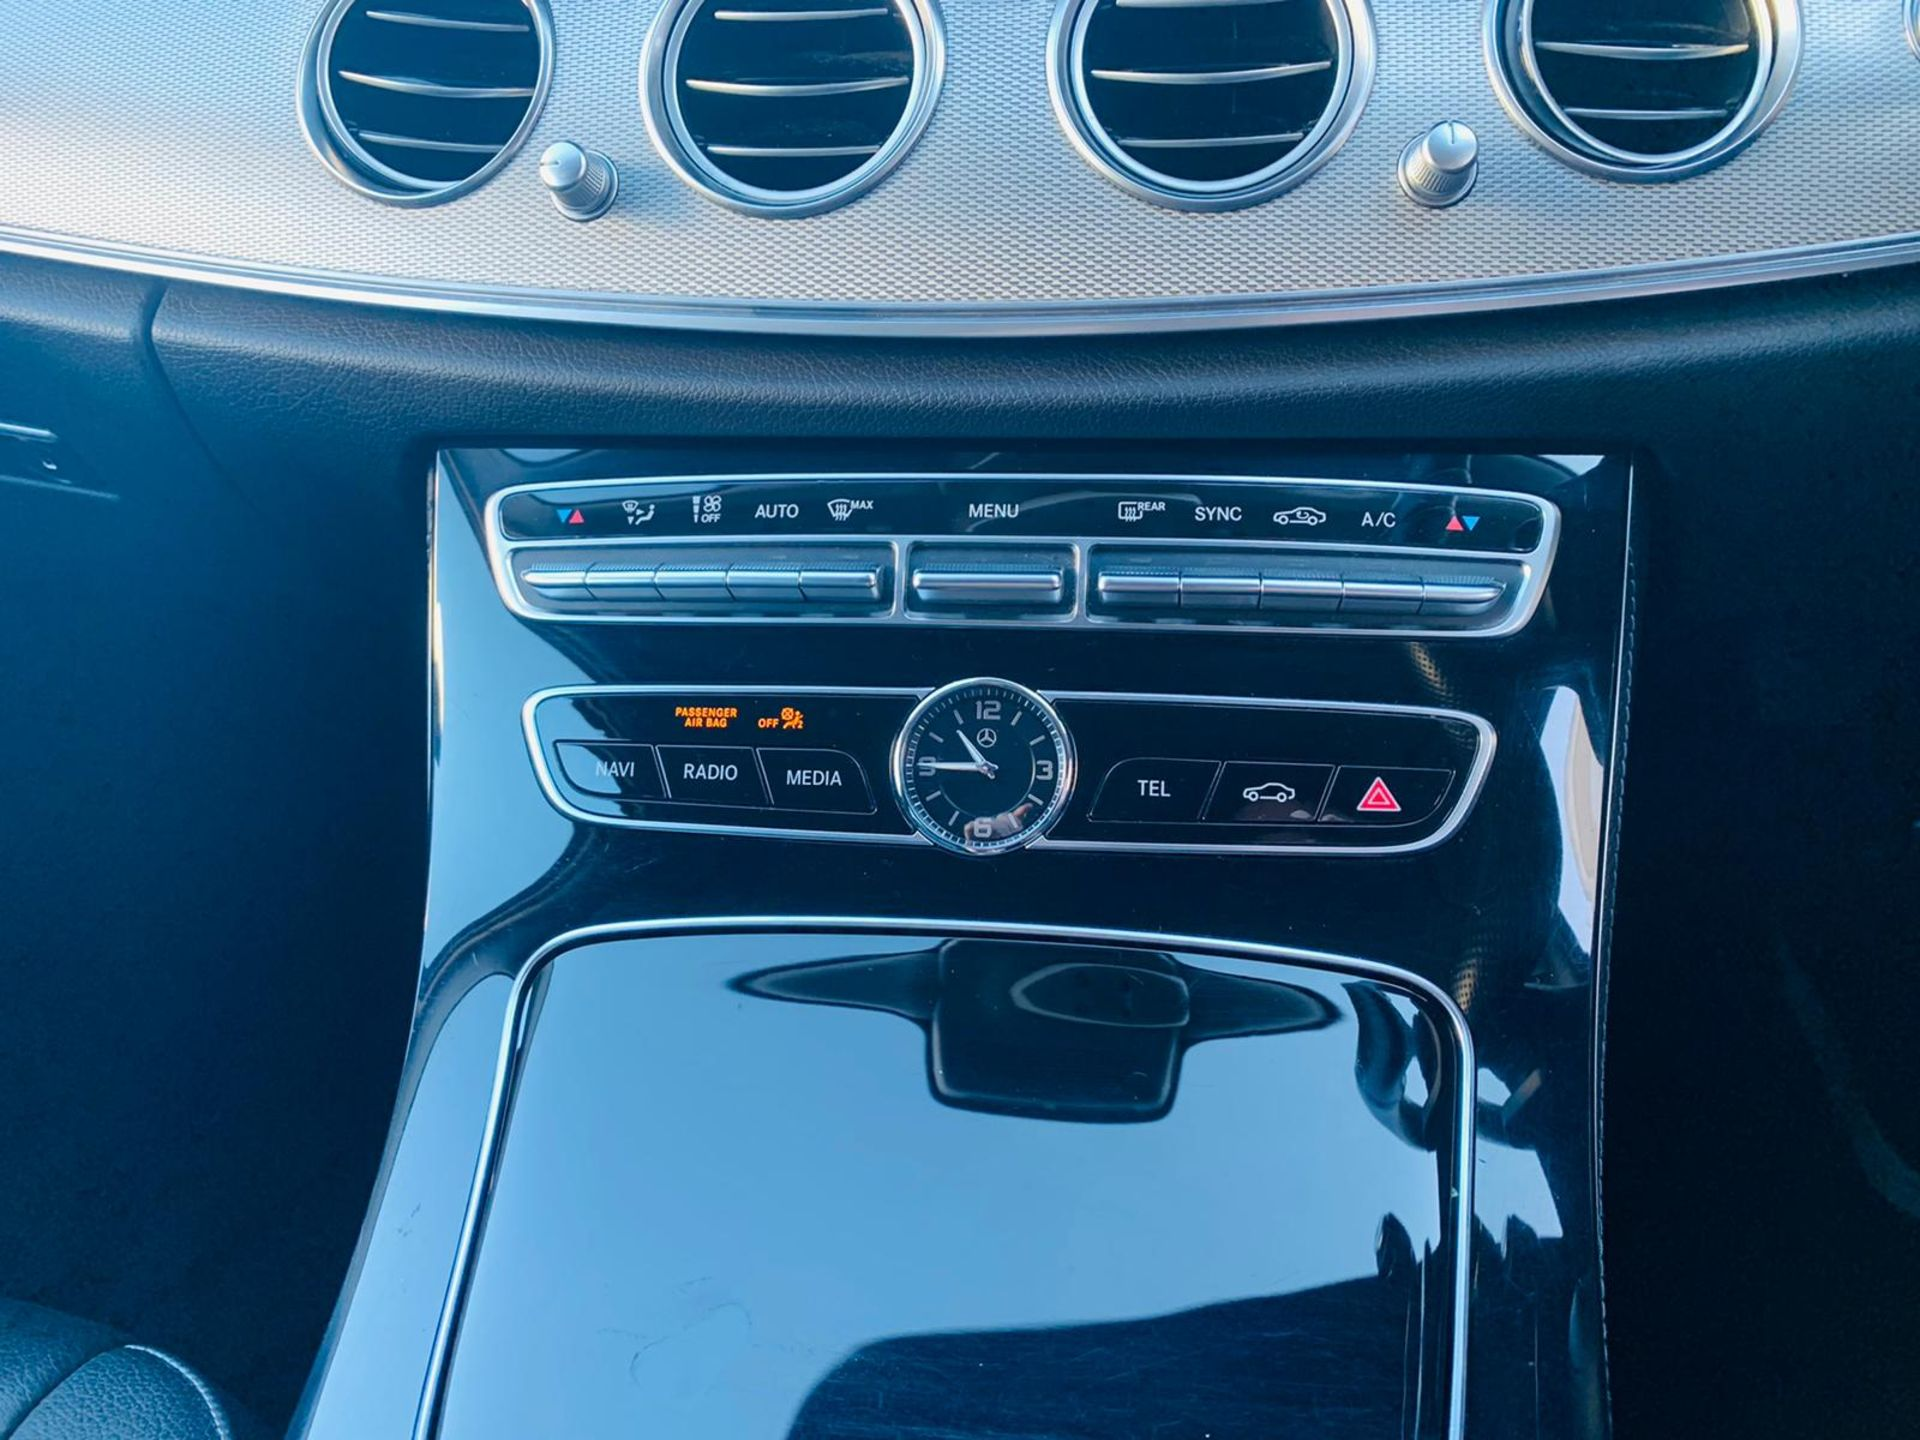 (RESERVE MET) Mercedes E220d Special Equipment Auto 2017 17 Reg - Sat Nav - Reversing Cam - Image 21 of 27